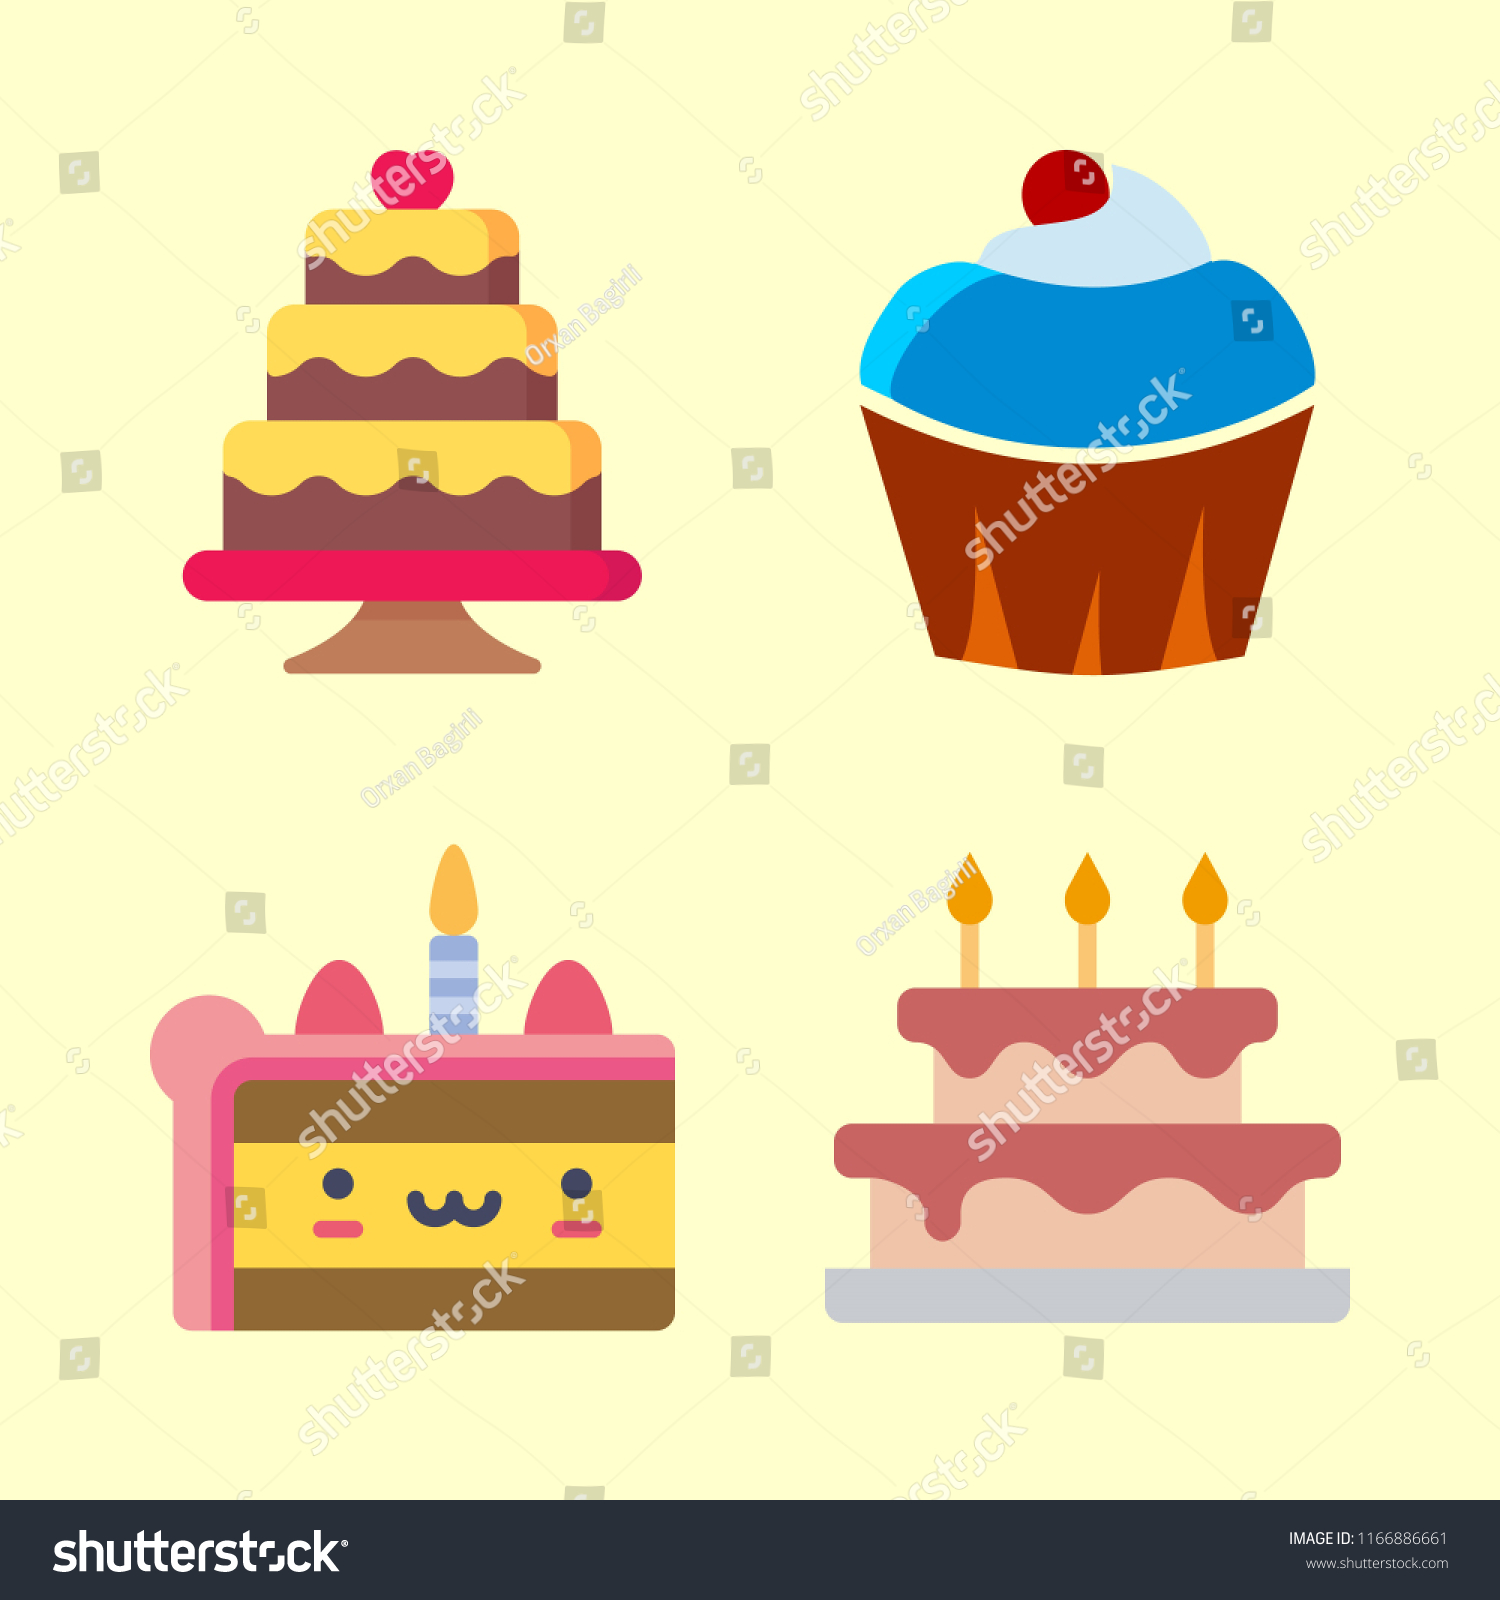 Cake Vector Icons Set Wedding Cake Stock Vector (Royalty Free ...